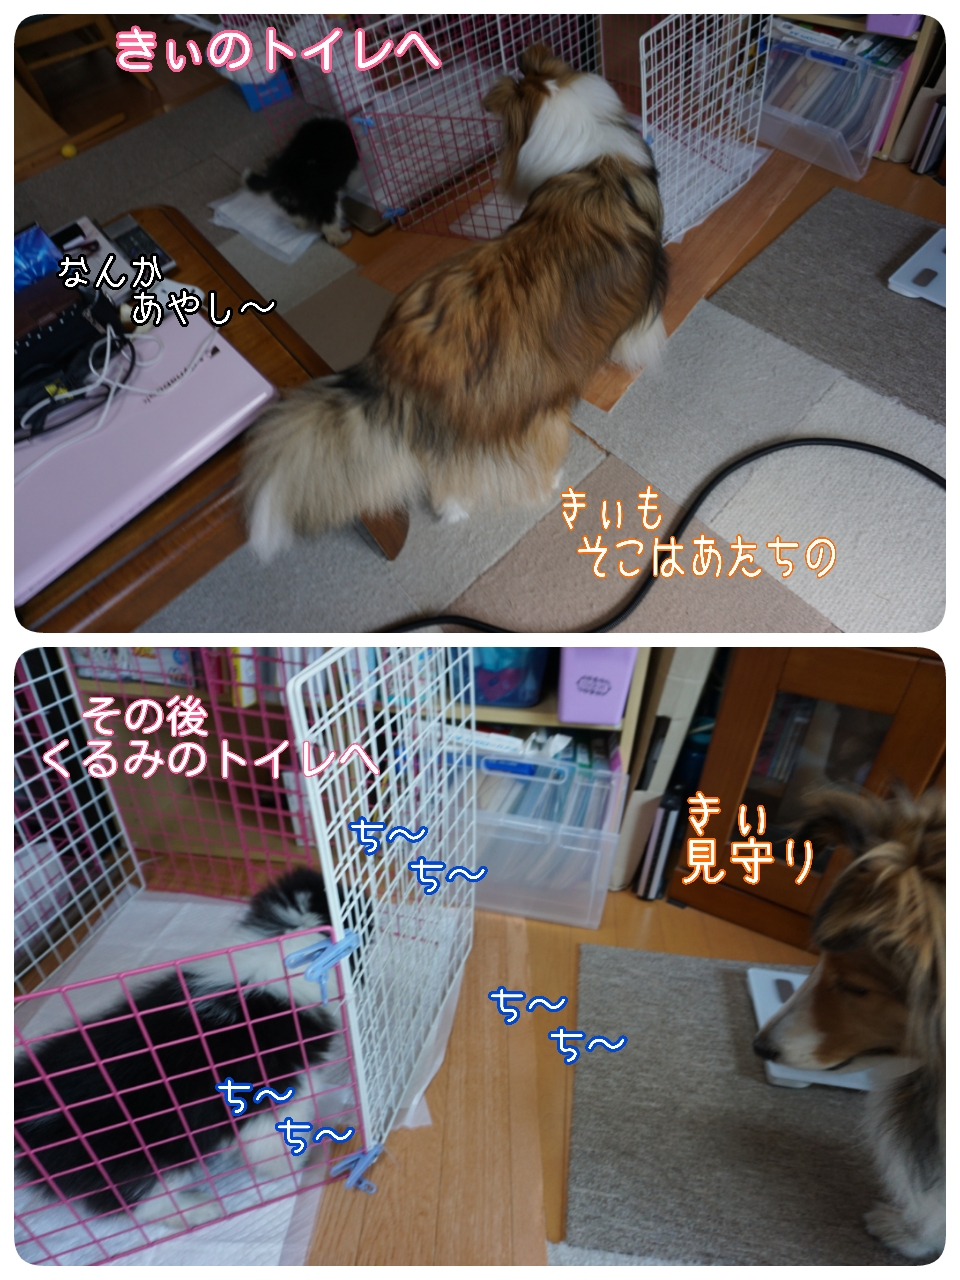 2015-05-07-12-48-07_deco.jpg